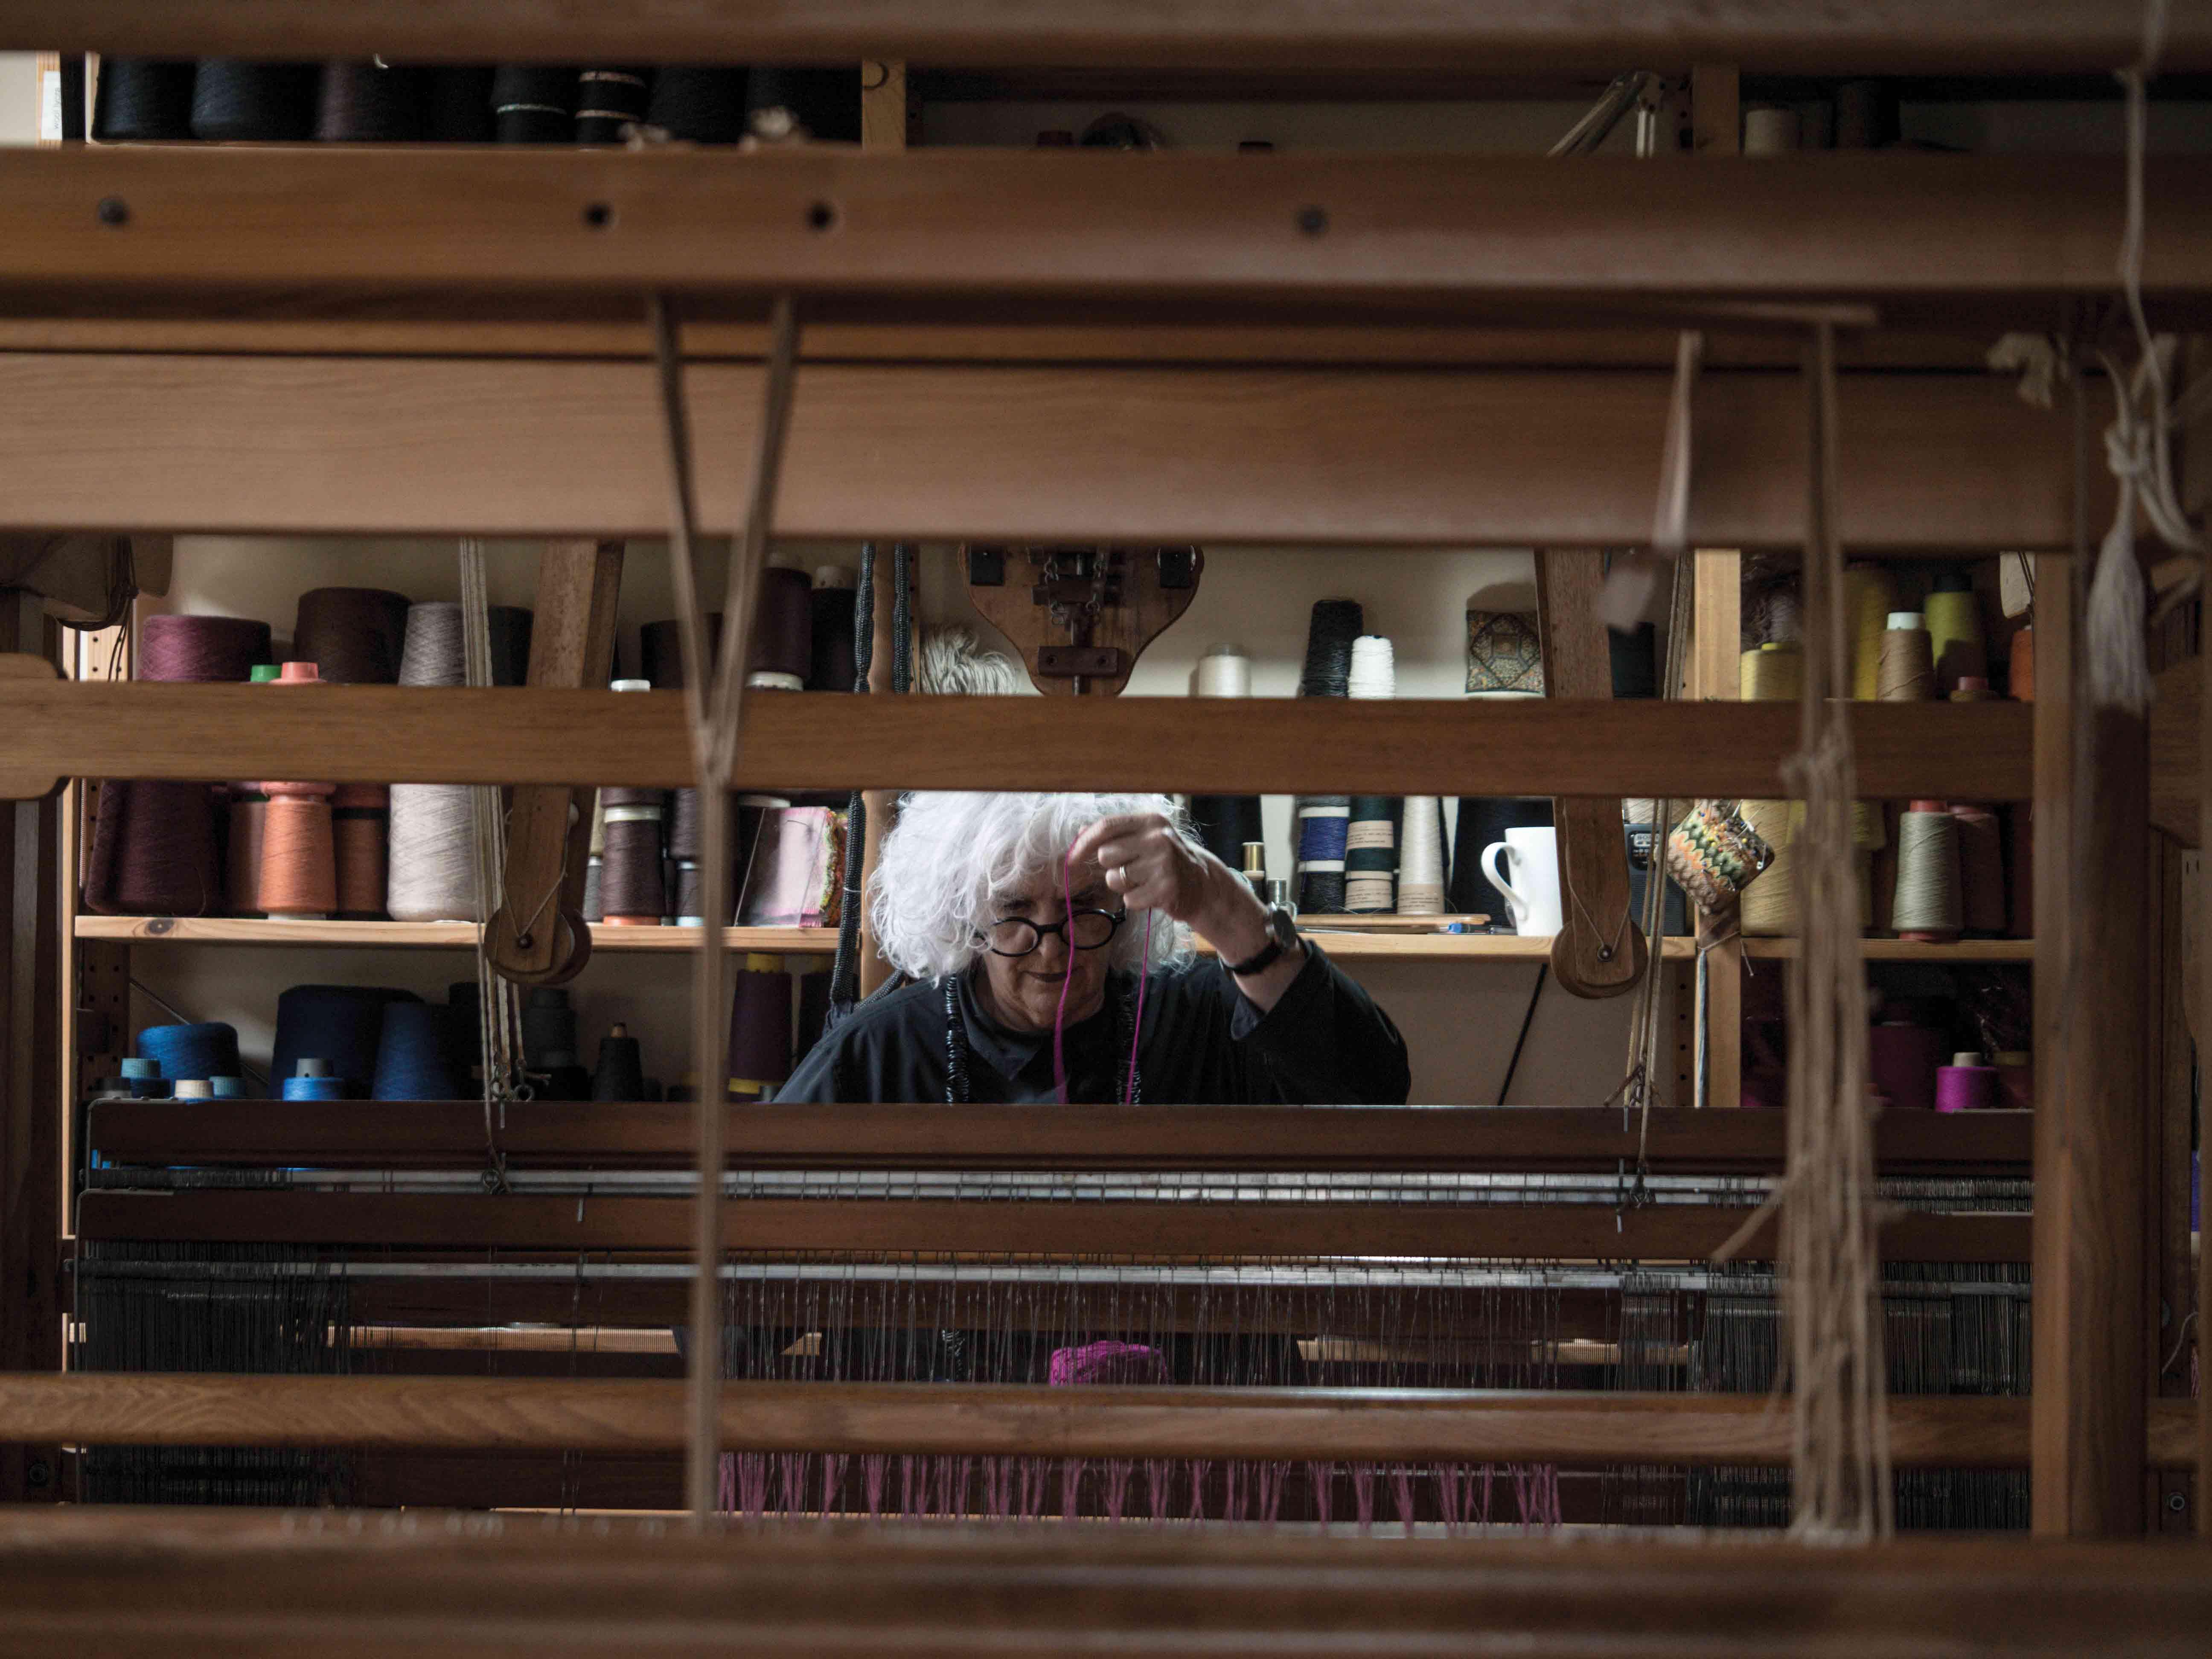 https://sydney-craft-week-prd.s3.amazonaws.com/media/uploads/images/Liz_Williamson_400kb.jpg